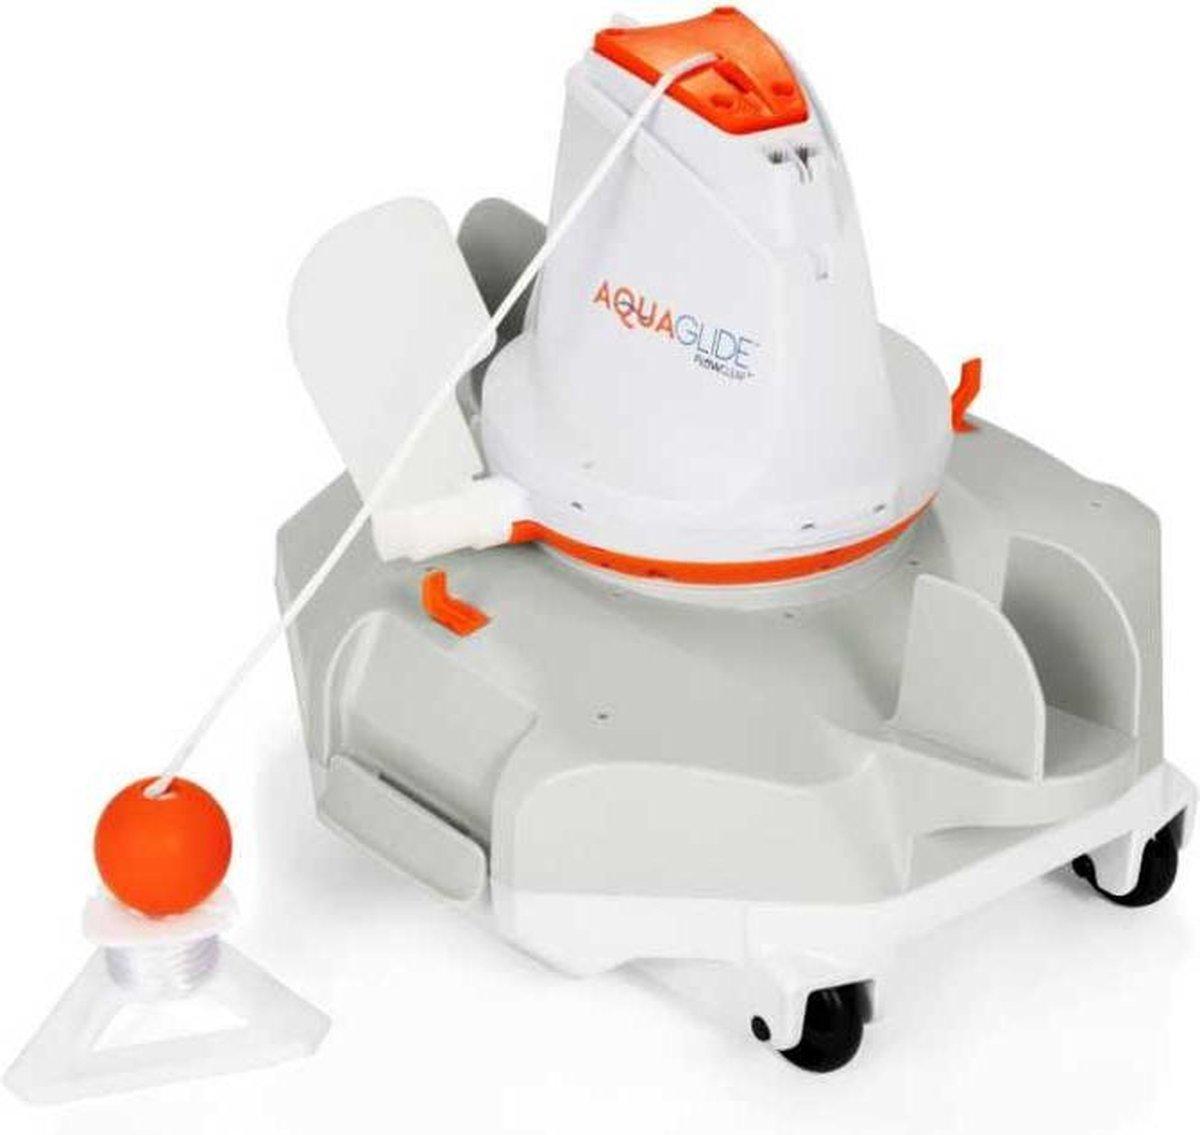 Bestway Flowclear - Aquaglide - Zwembad bodemstofzuiger robot - Oplaadbaar